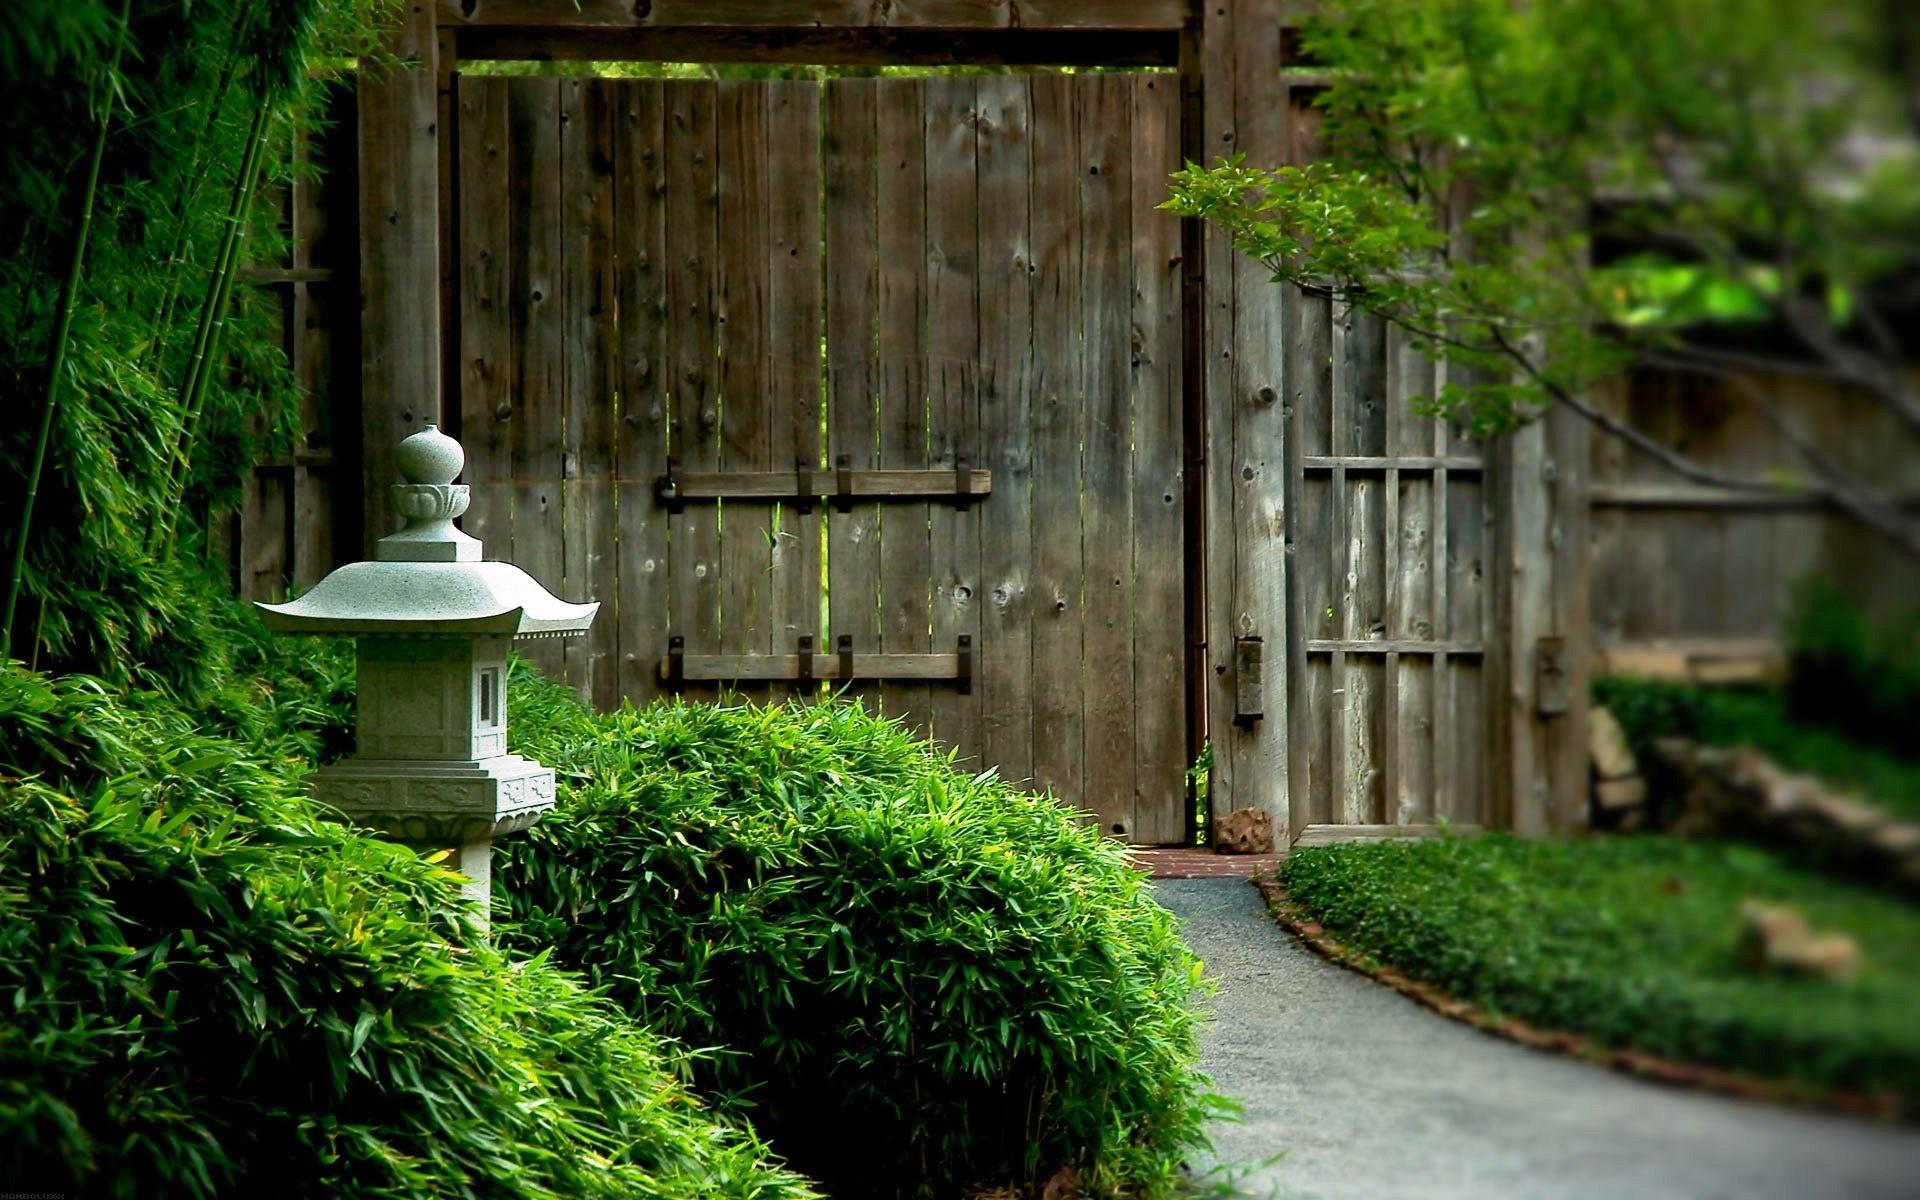 green garden images